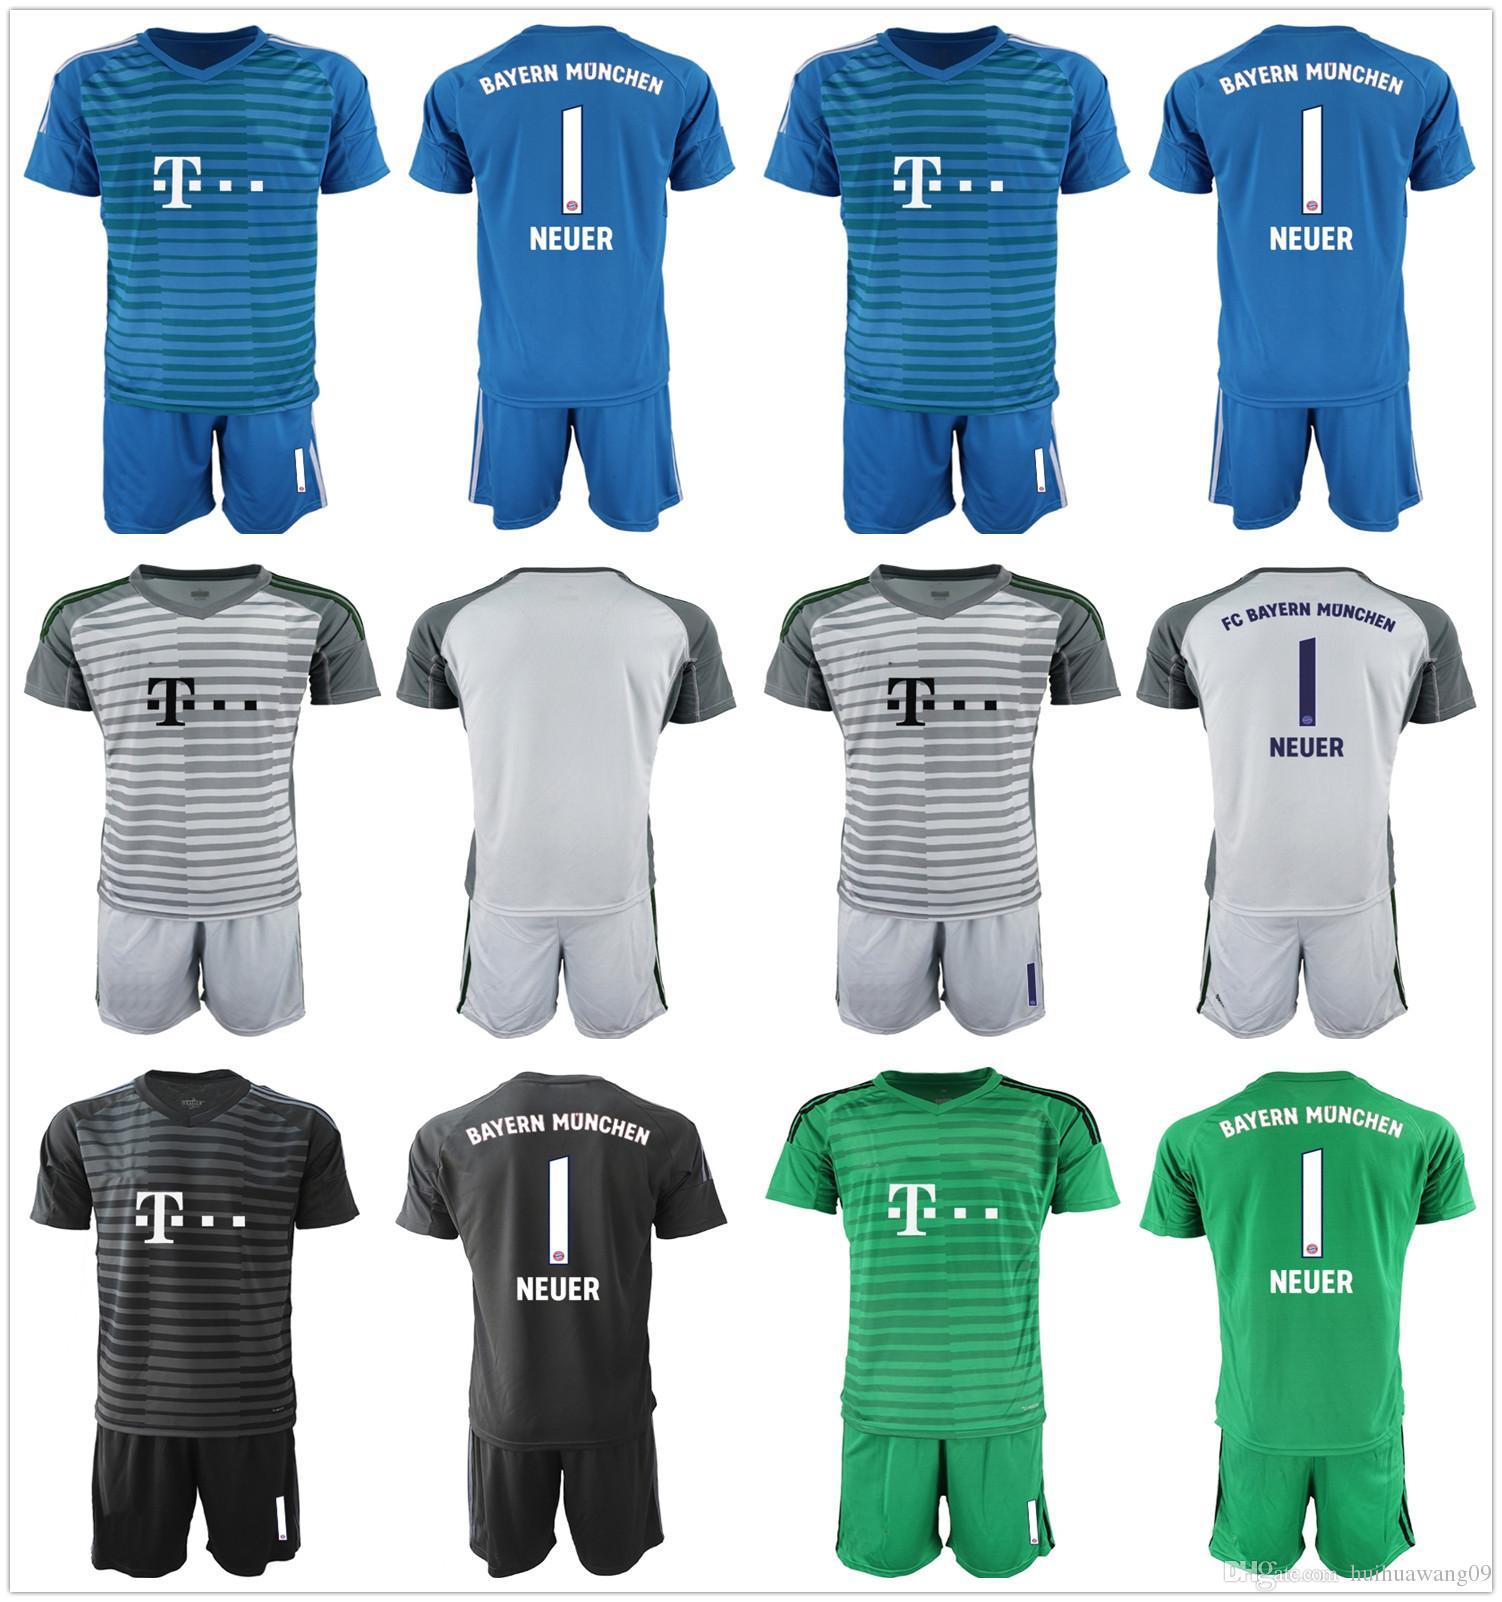 29646f9994a 2019 2018 2019 Adults Neuer Goalkeeer Soccer Sets Manuel Neuer Jerseys  Lewandowski Robben Grey Green Black Kit Football Goalie Soccer Uniform From  ...